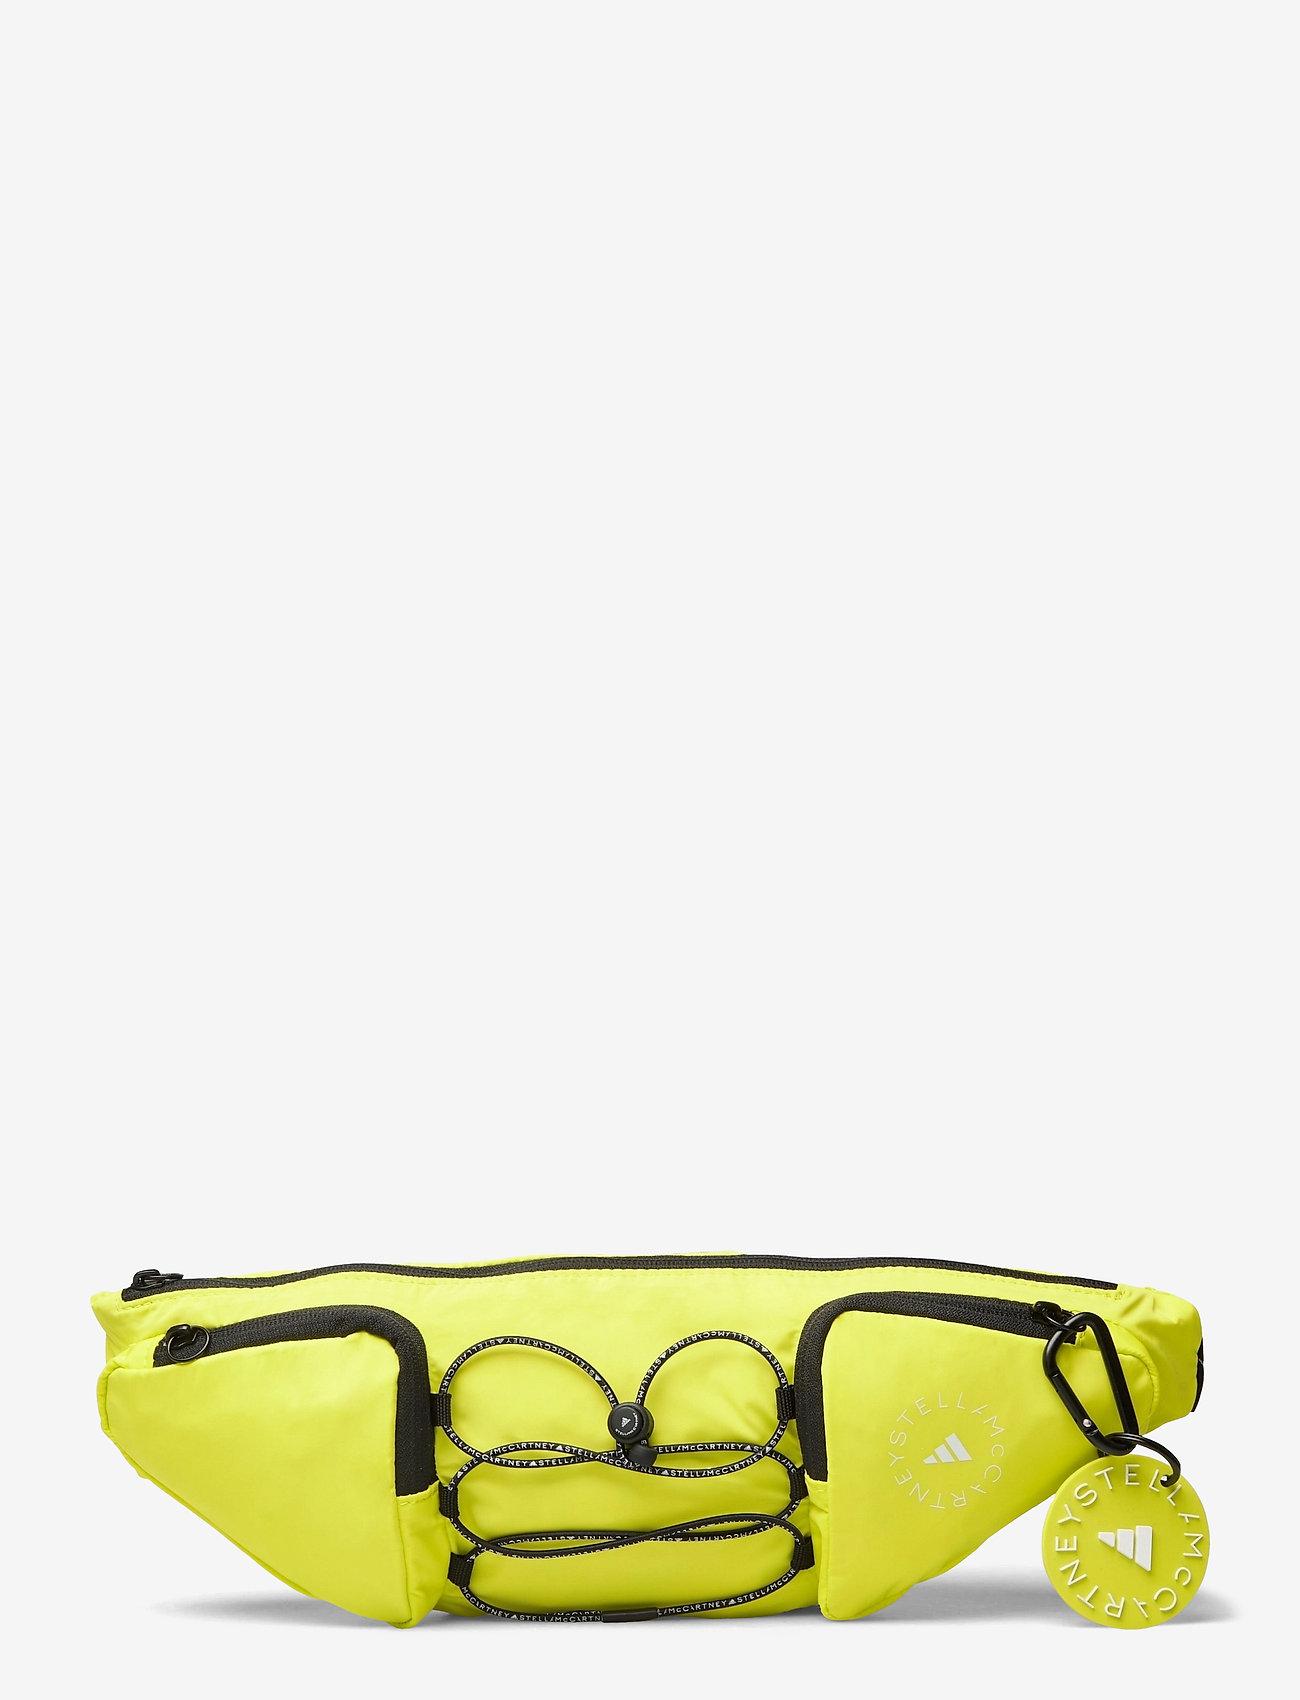 adidas by Stella McCartney - aSMC BUMBAG - belt bags - aciyel/black - 0